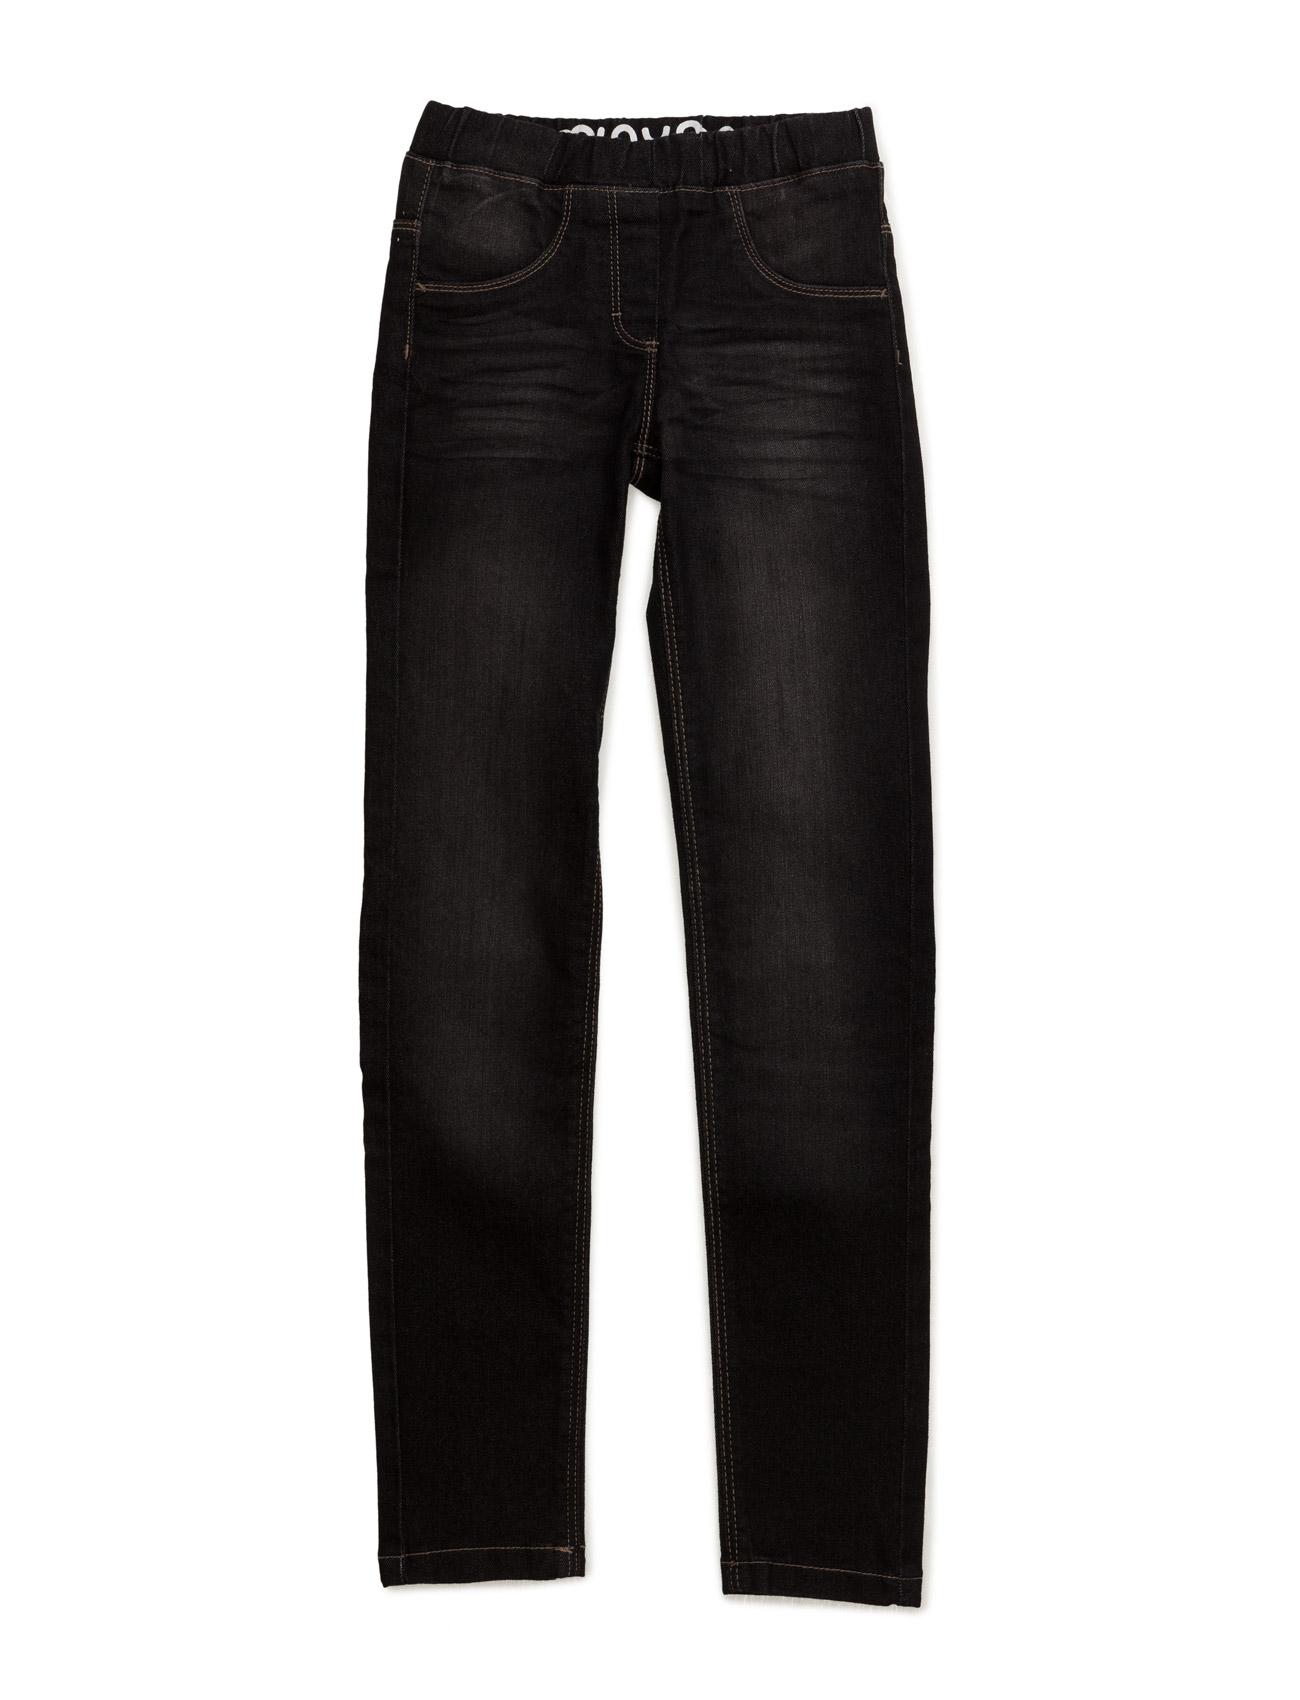 Jeans Girl - Slim Fit - Minymo